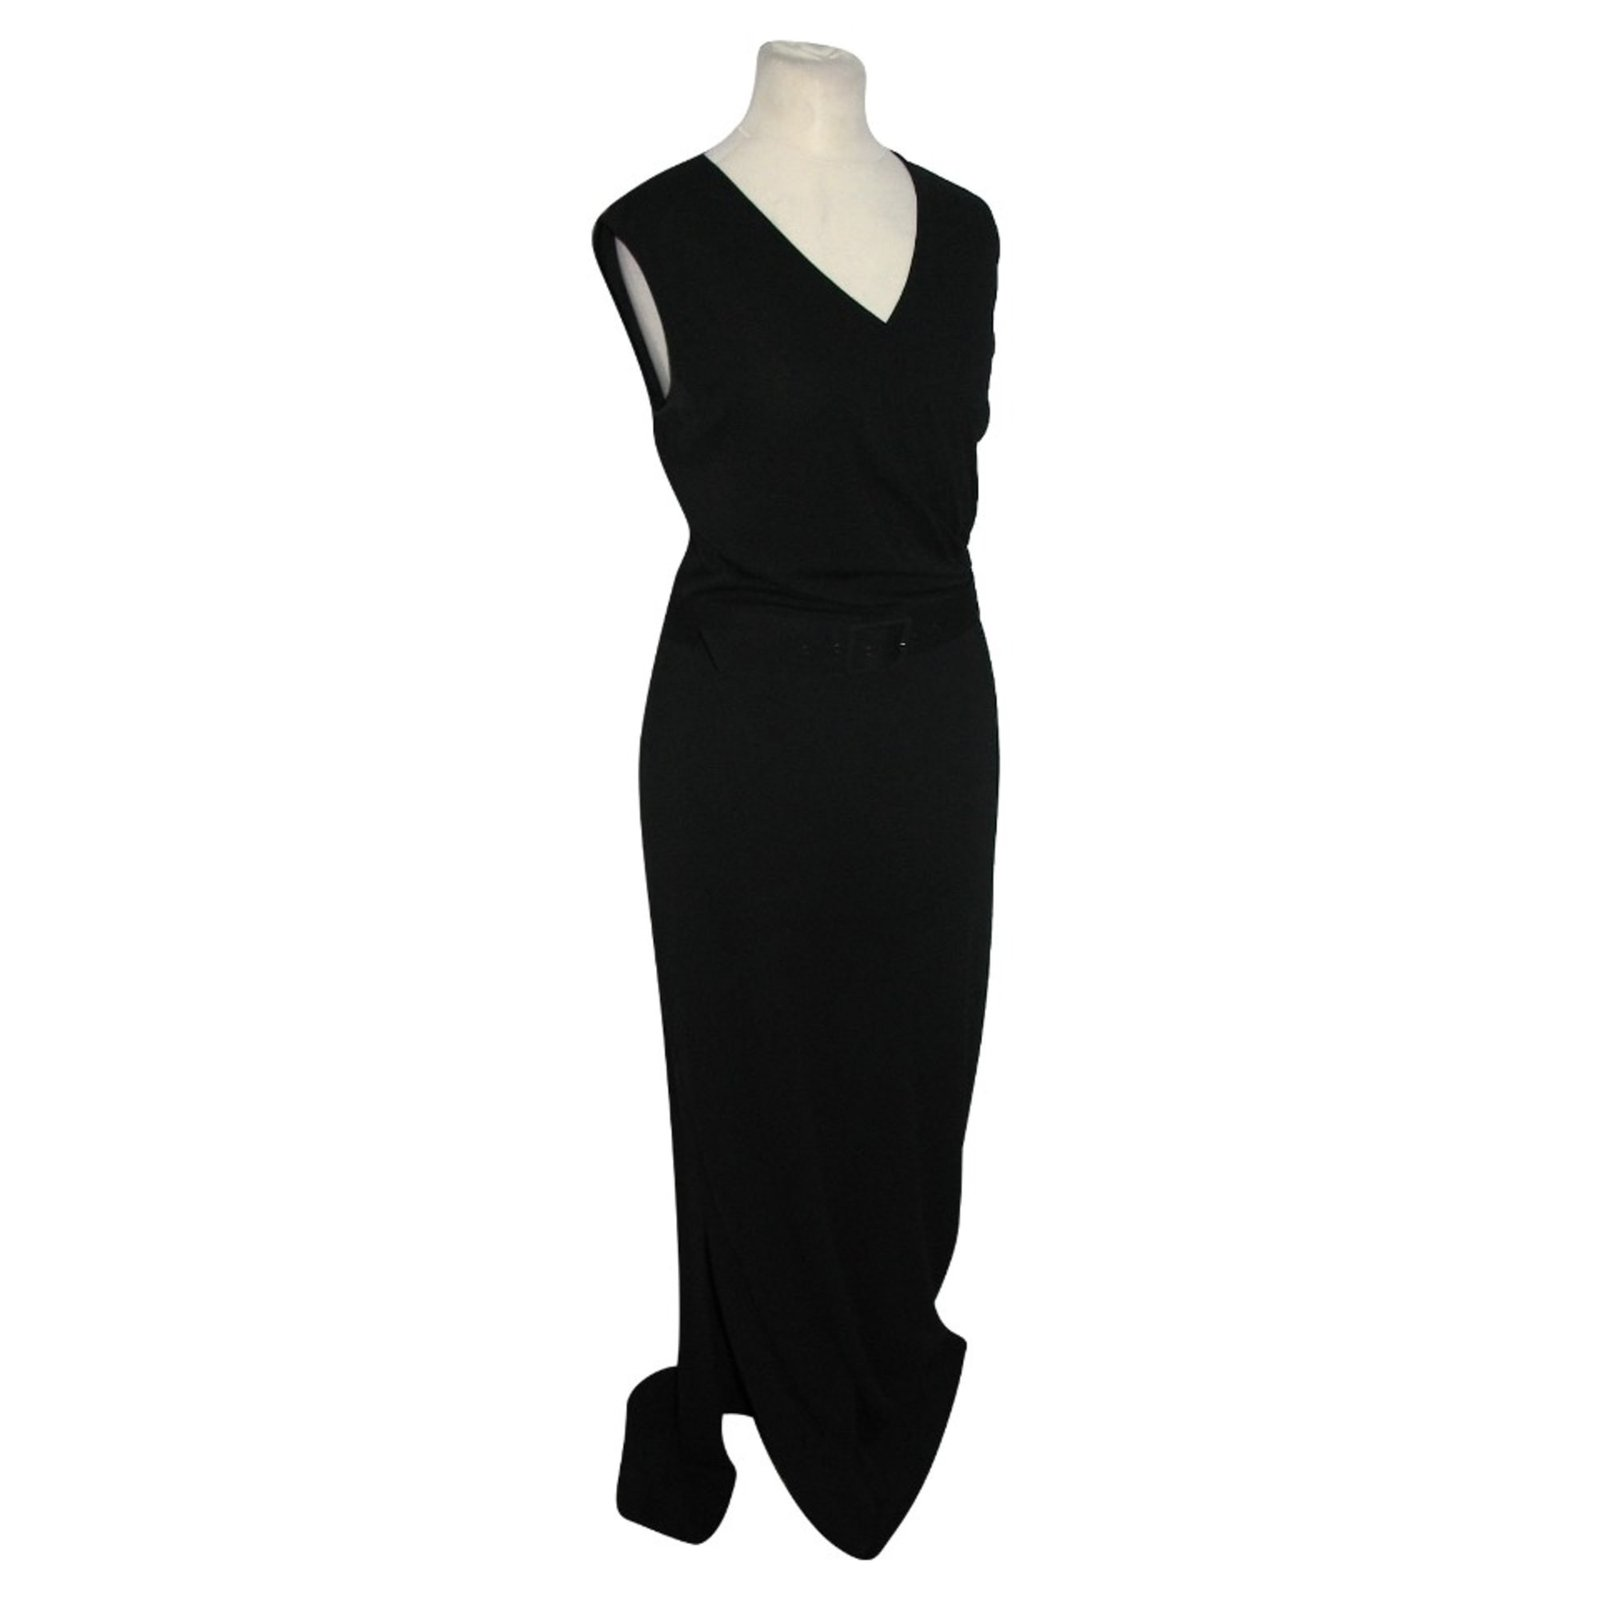 fec6f05c628 Max Mara Long black dress with belt Dresses Other Black ref.98495 ...